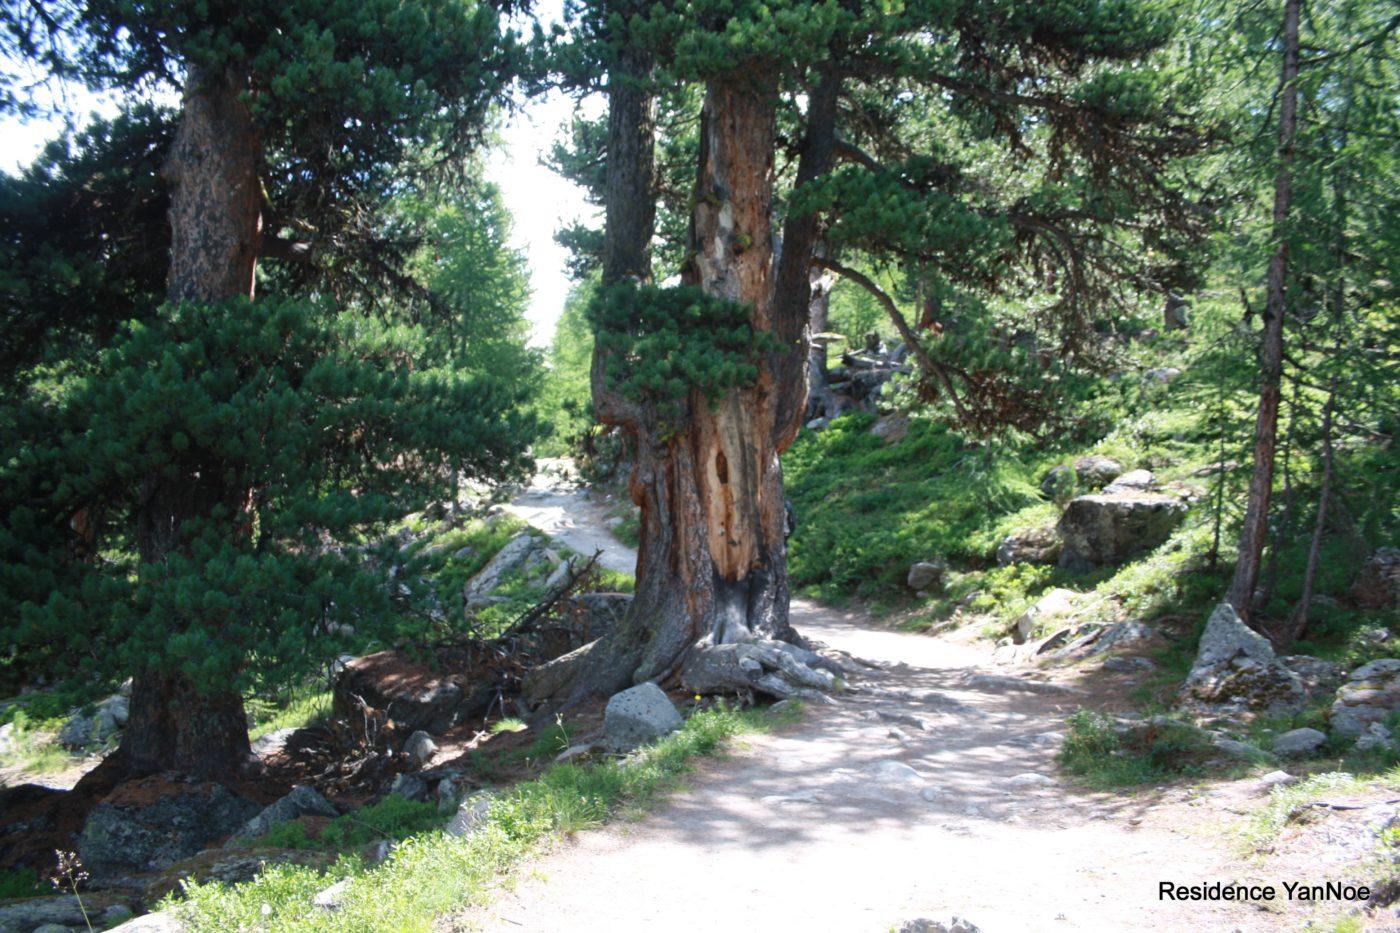 Mountainbiken | Residence YanNoe